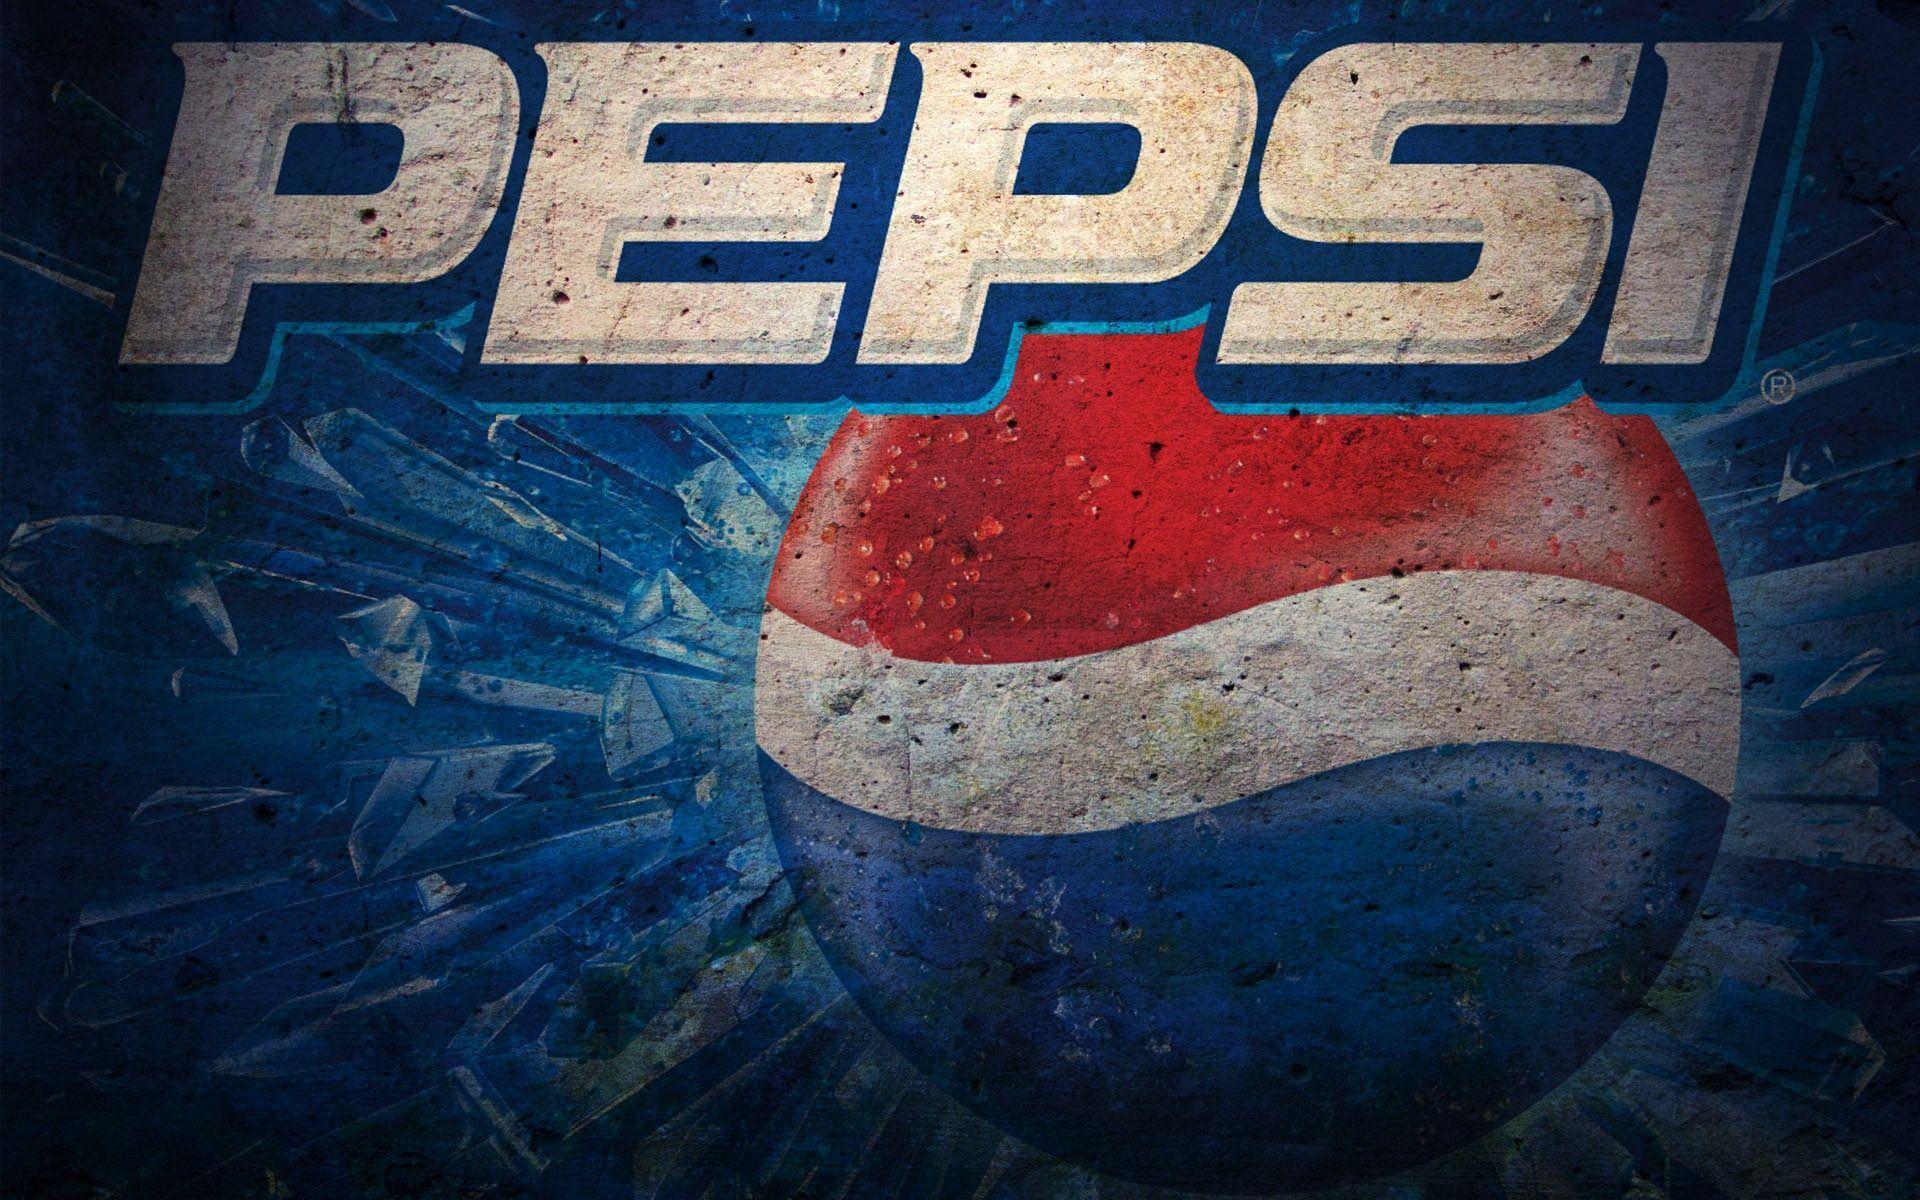 Cars Hd Wallpaper Cave Pepsi Cola Wallpapers Wallpaper Cave